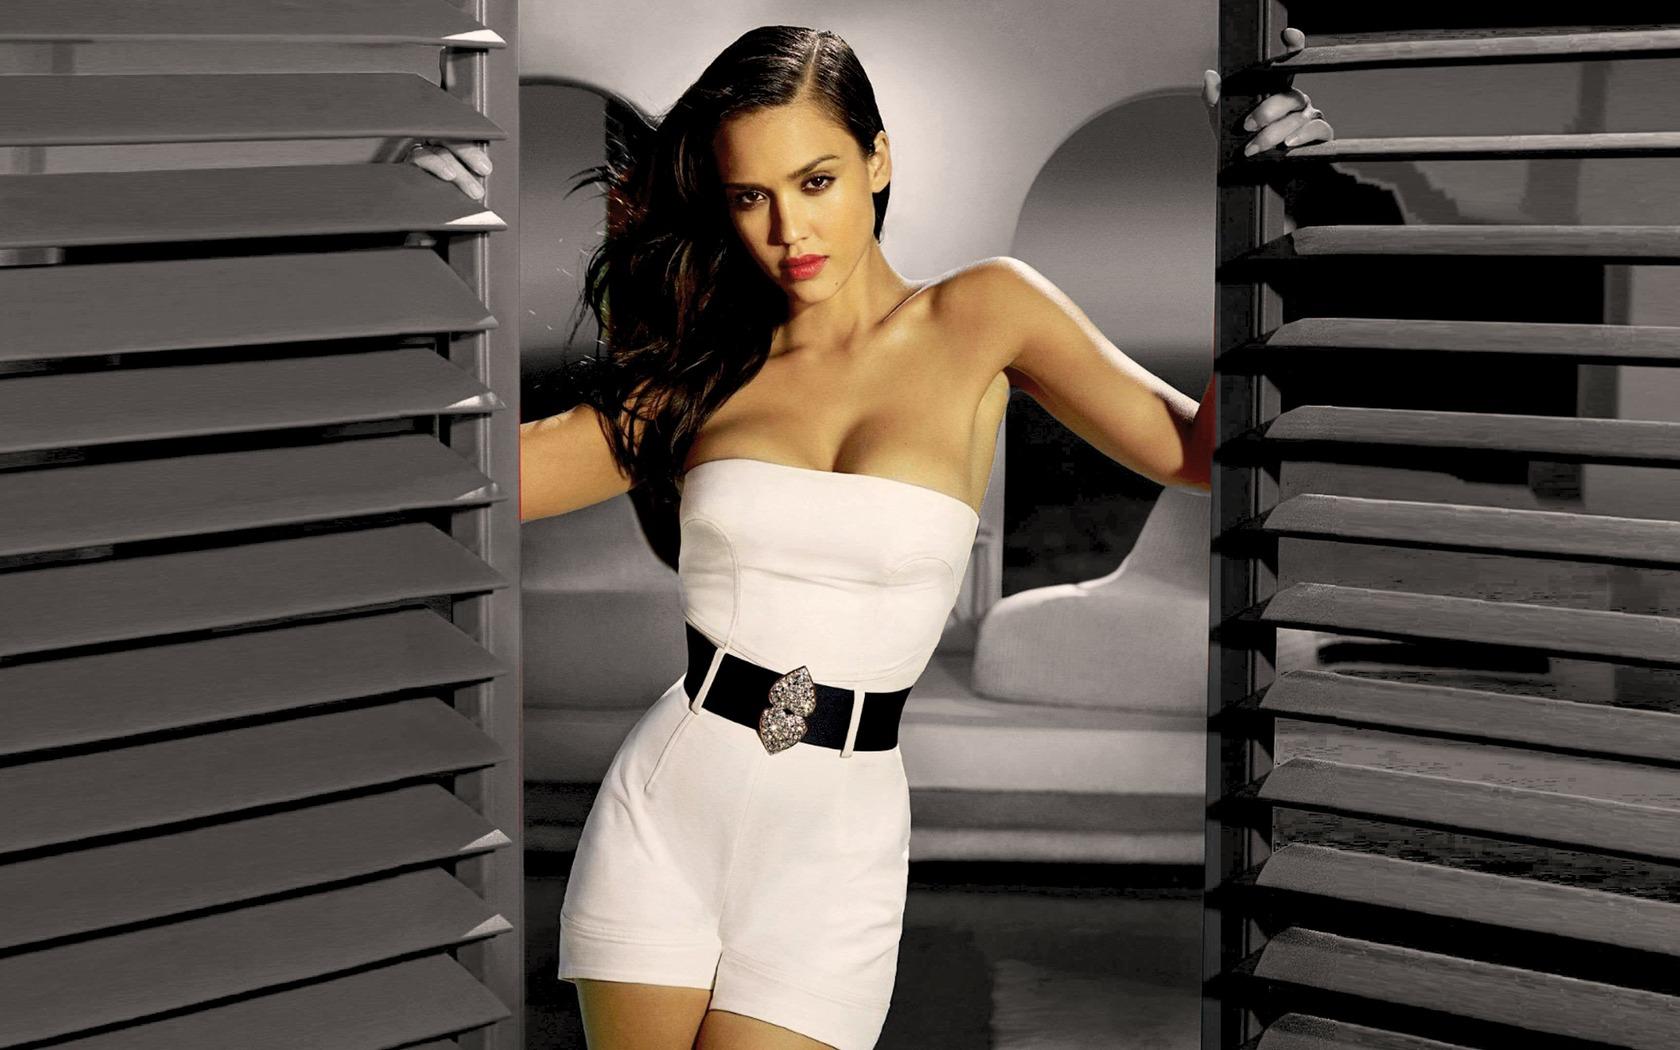 Jessica alba hot photo shoot